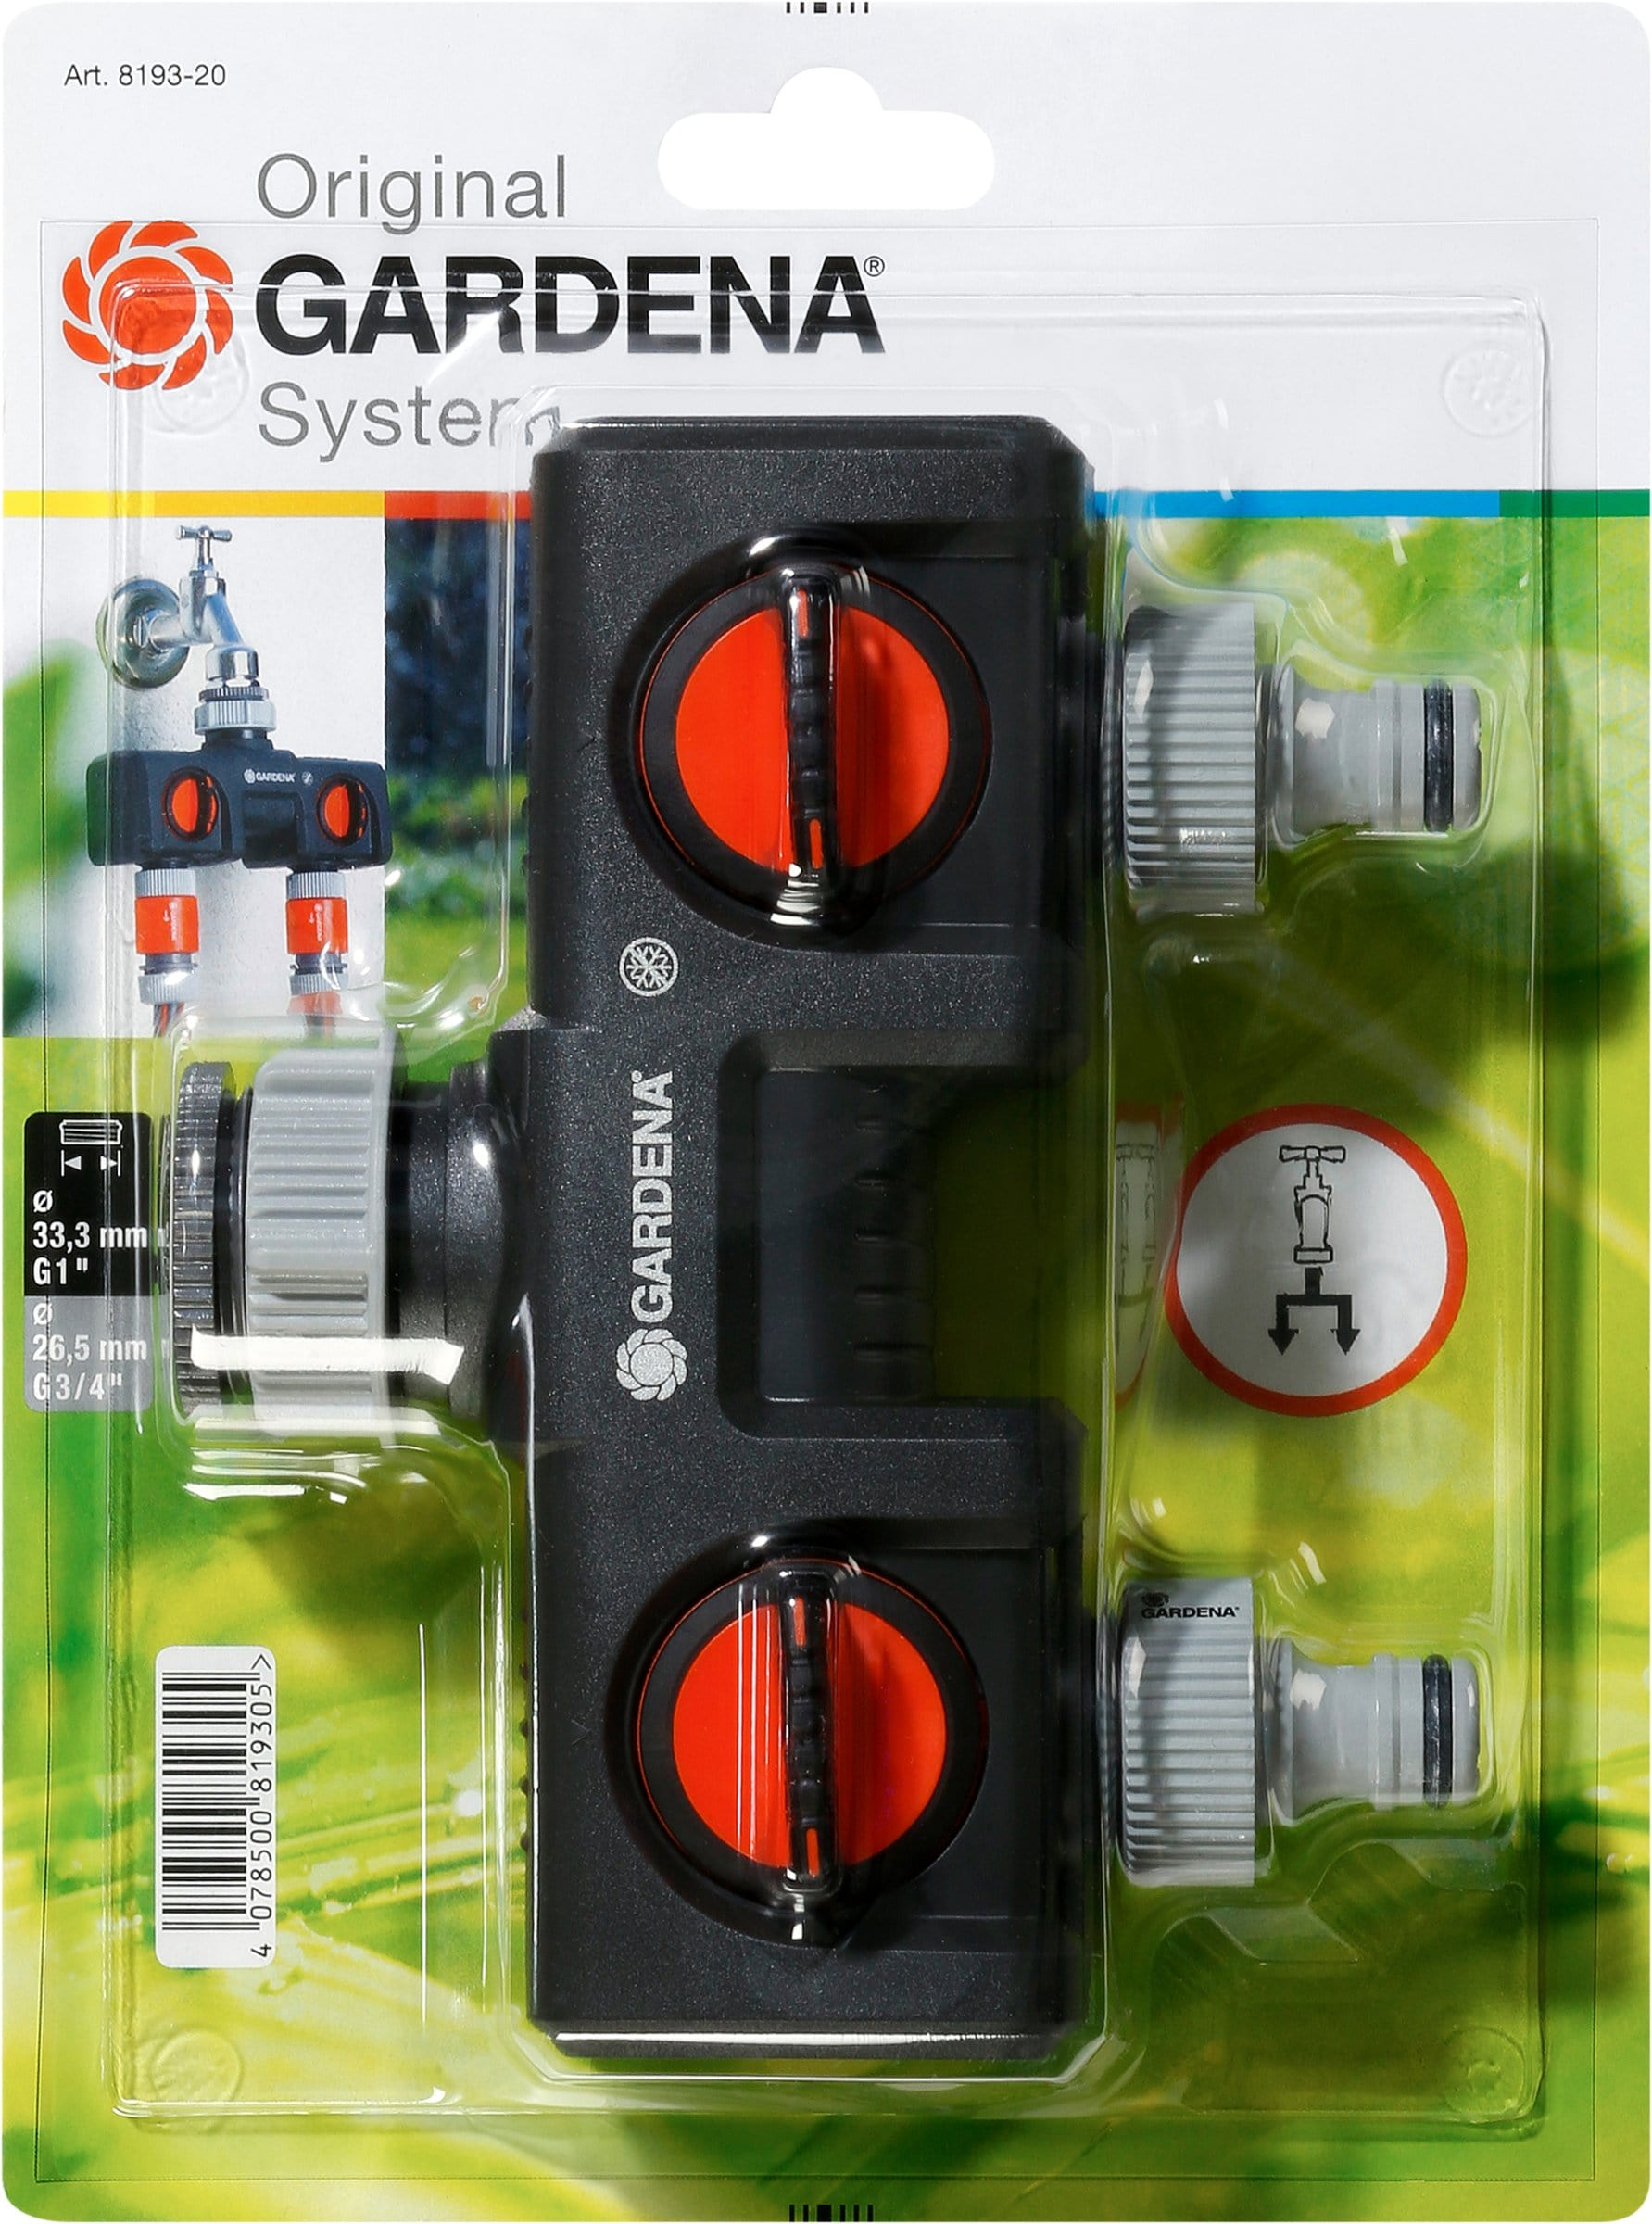 Gardena Original GARDENA System Sélecteur